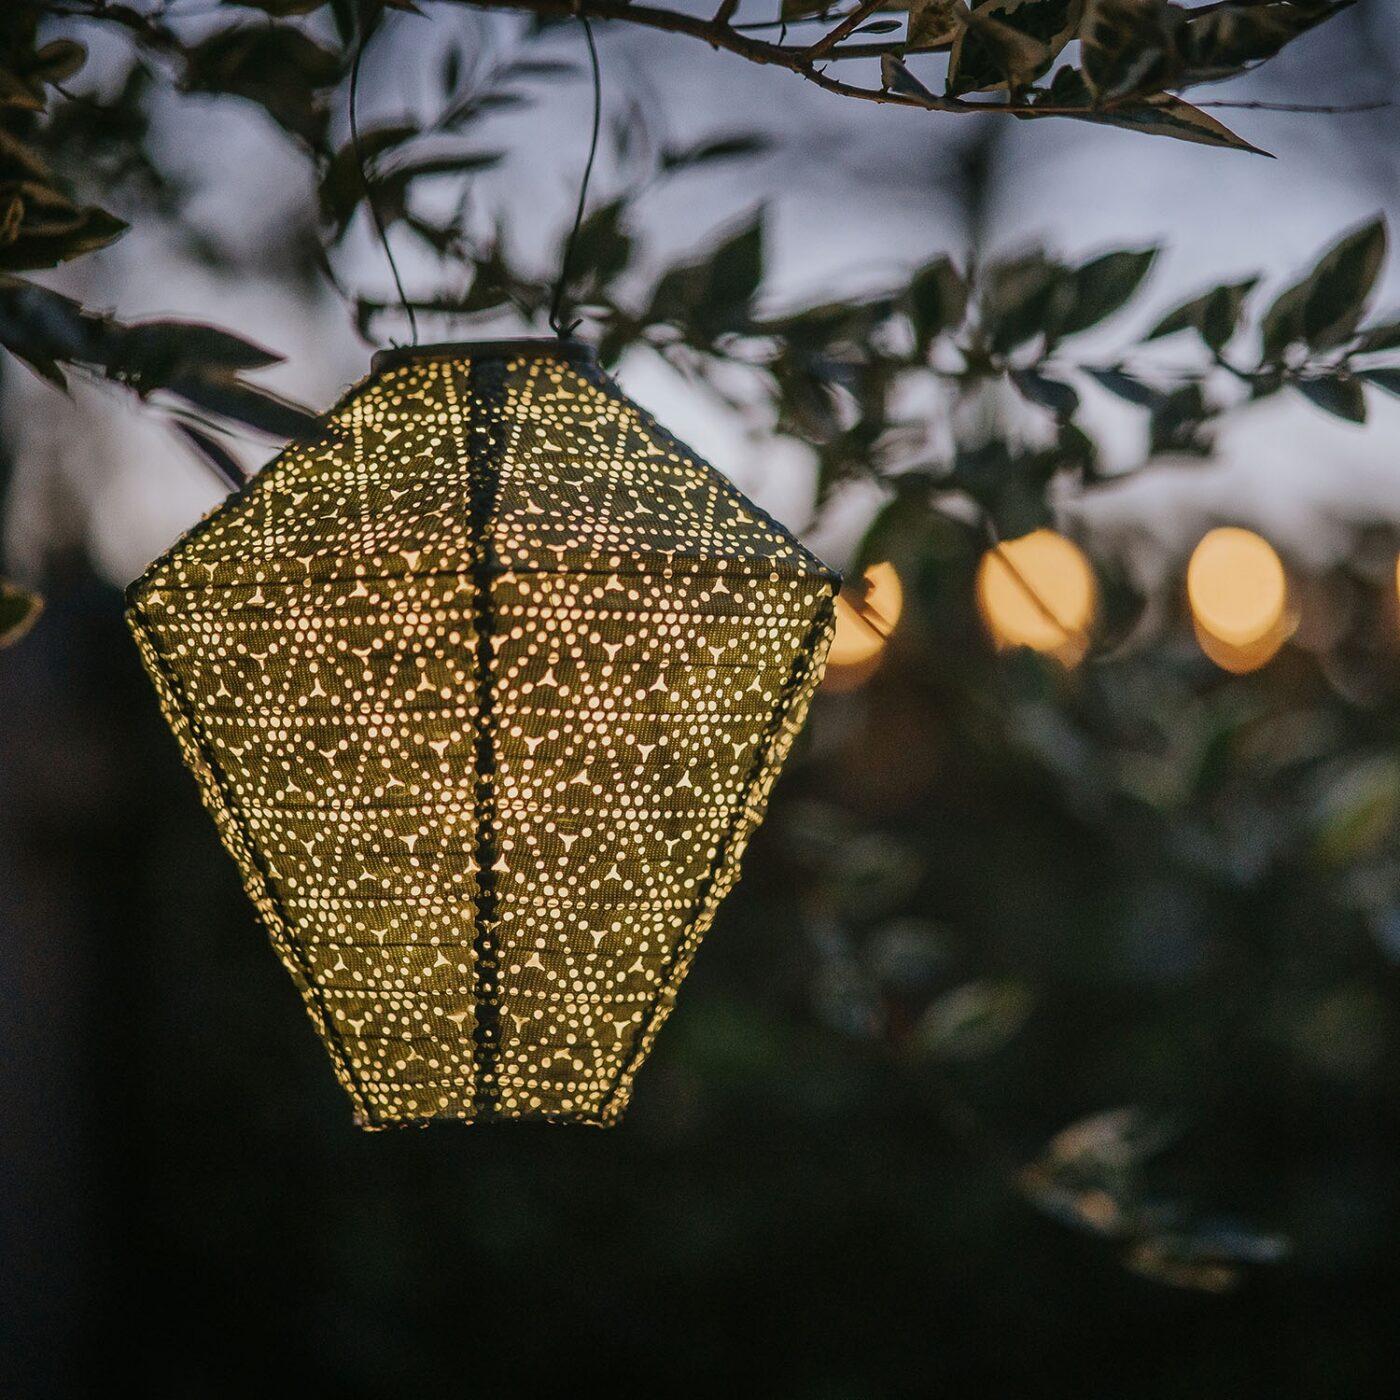 solar lantern green diamond close up lit at night